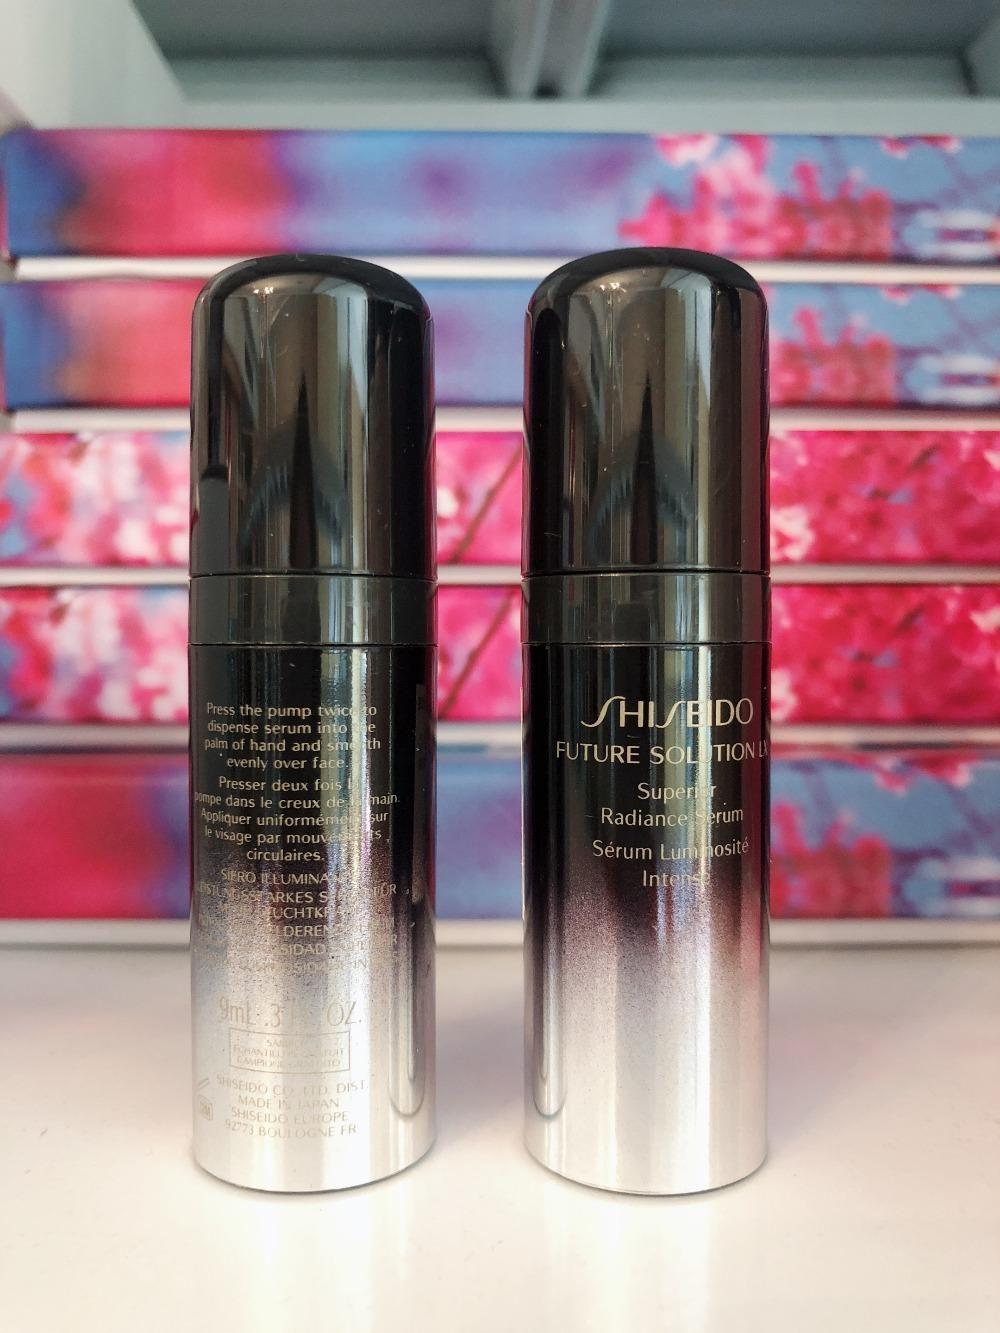 Shiseido资生堂时光琉璃御藏集效焕透精华液9ml